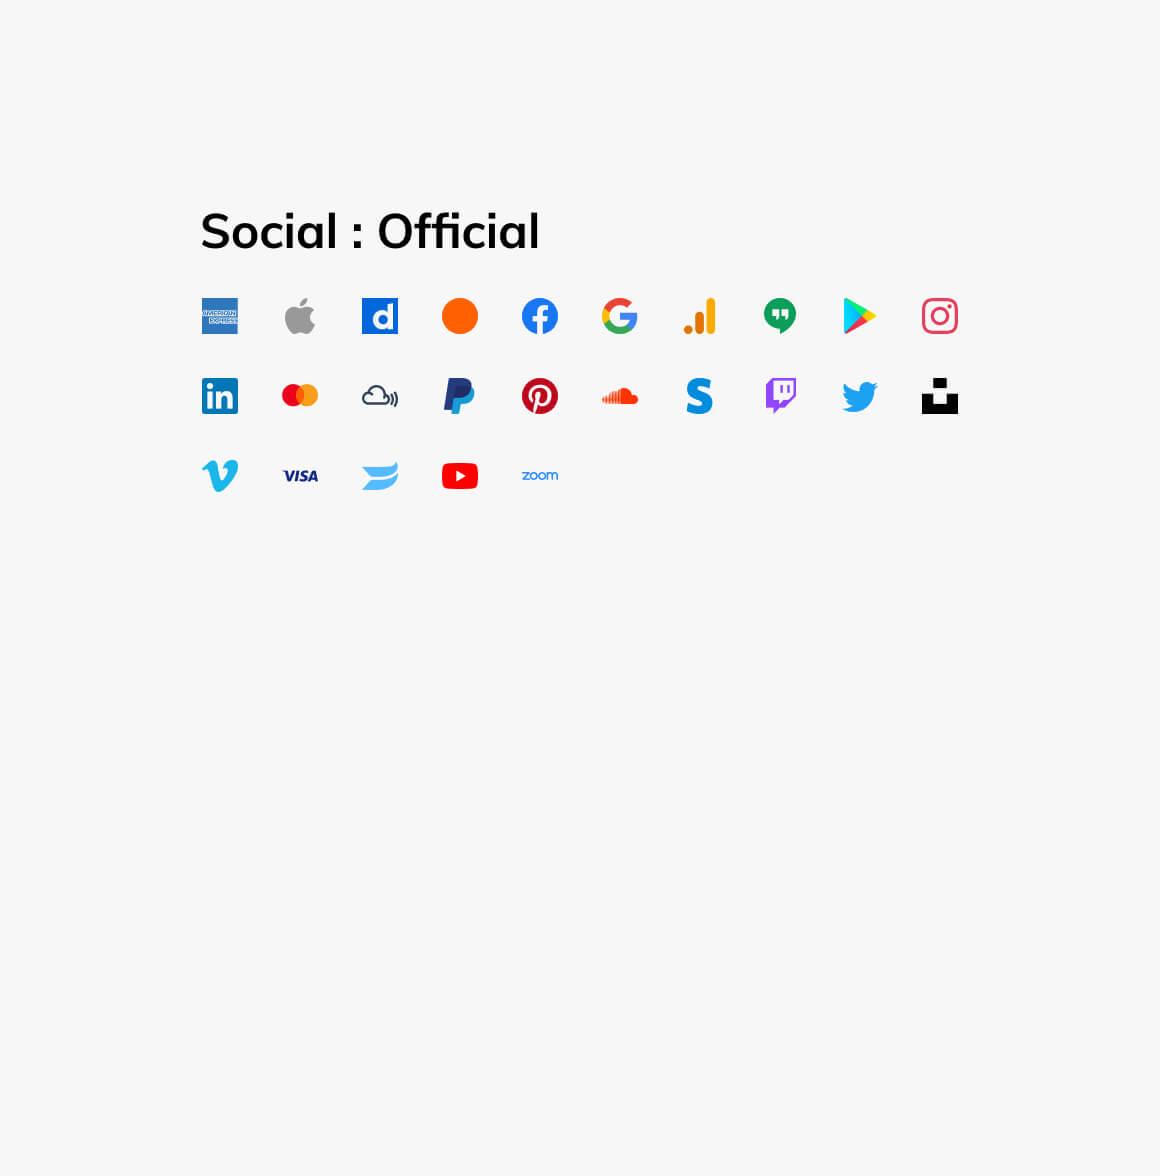 social official